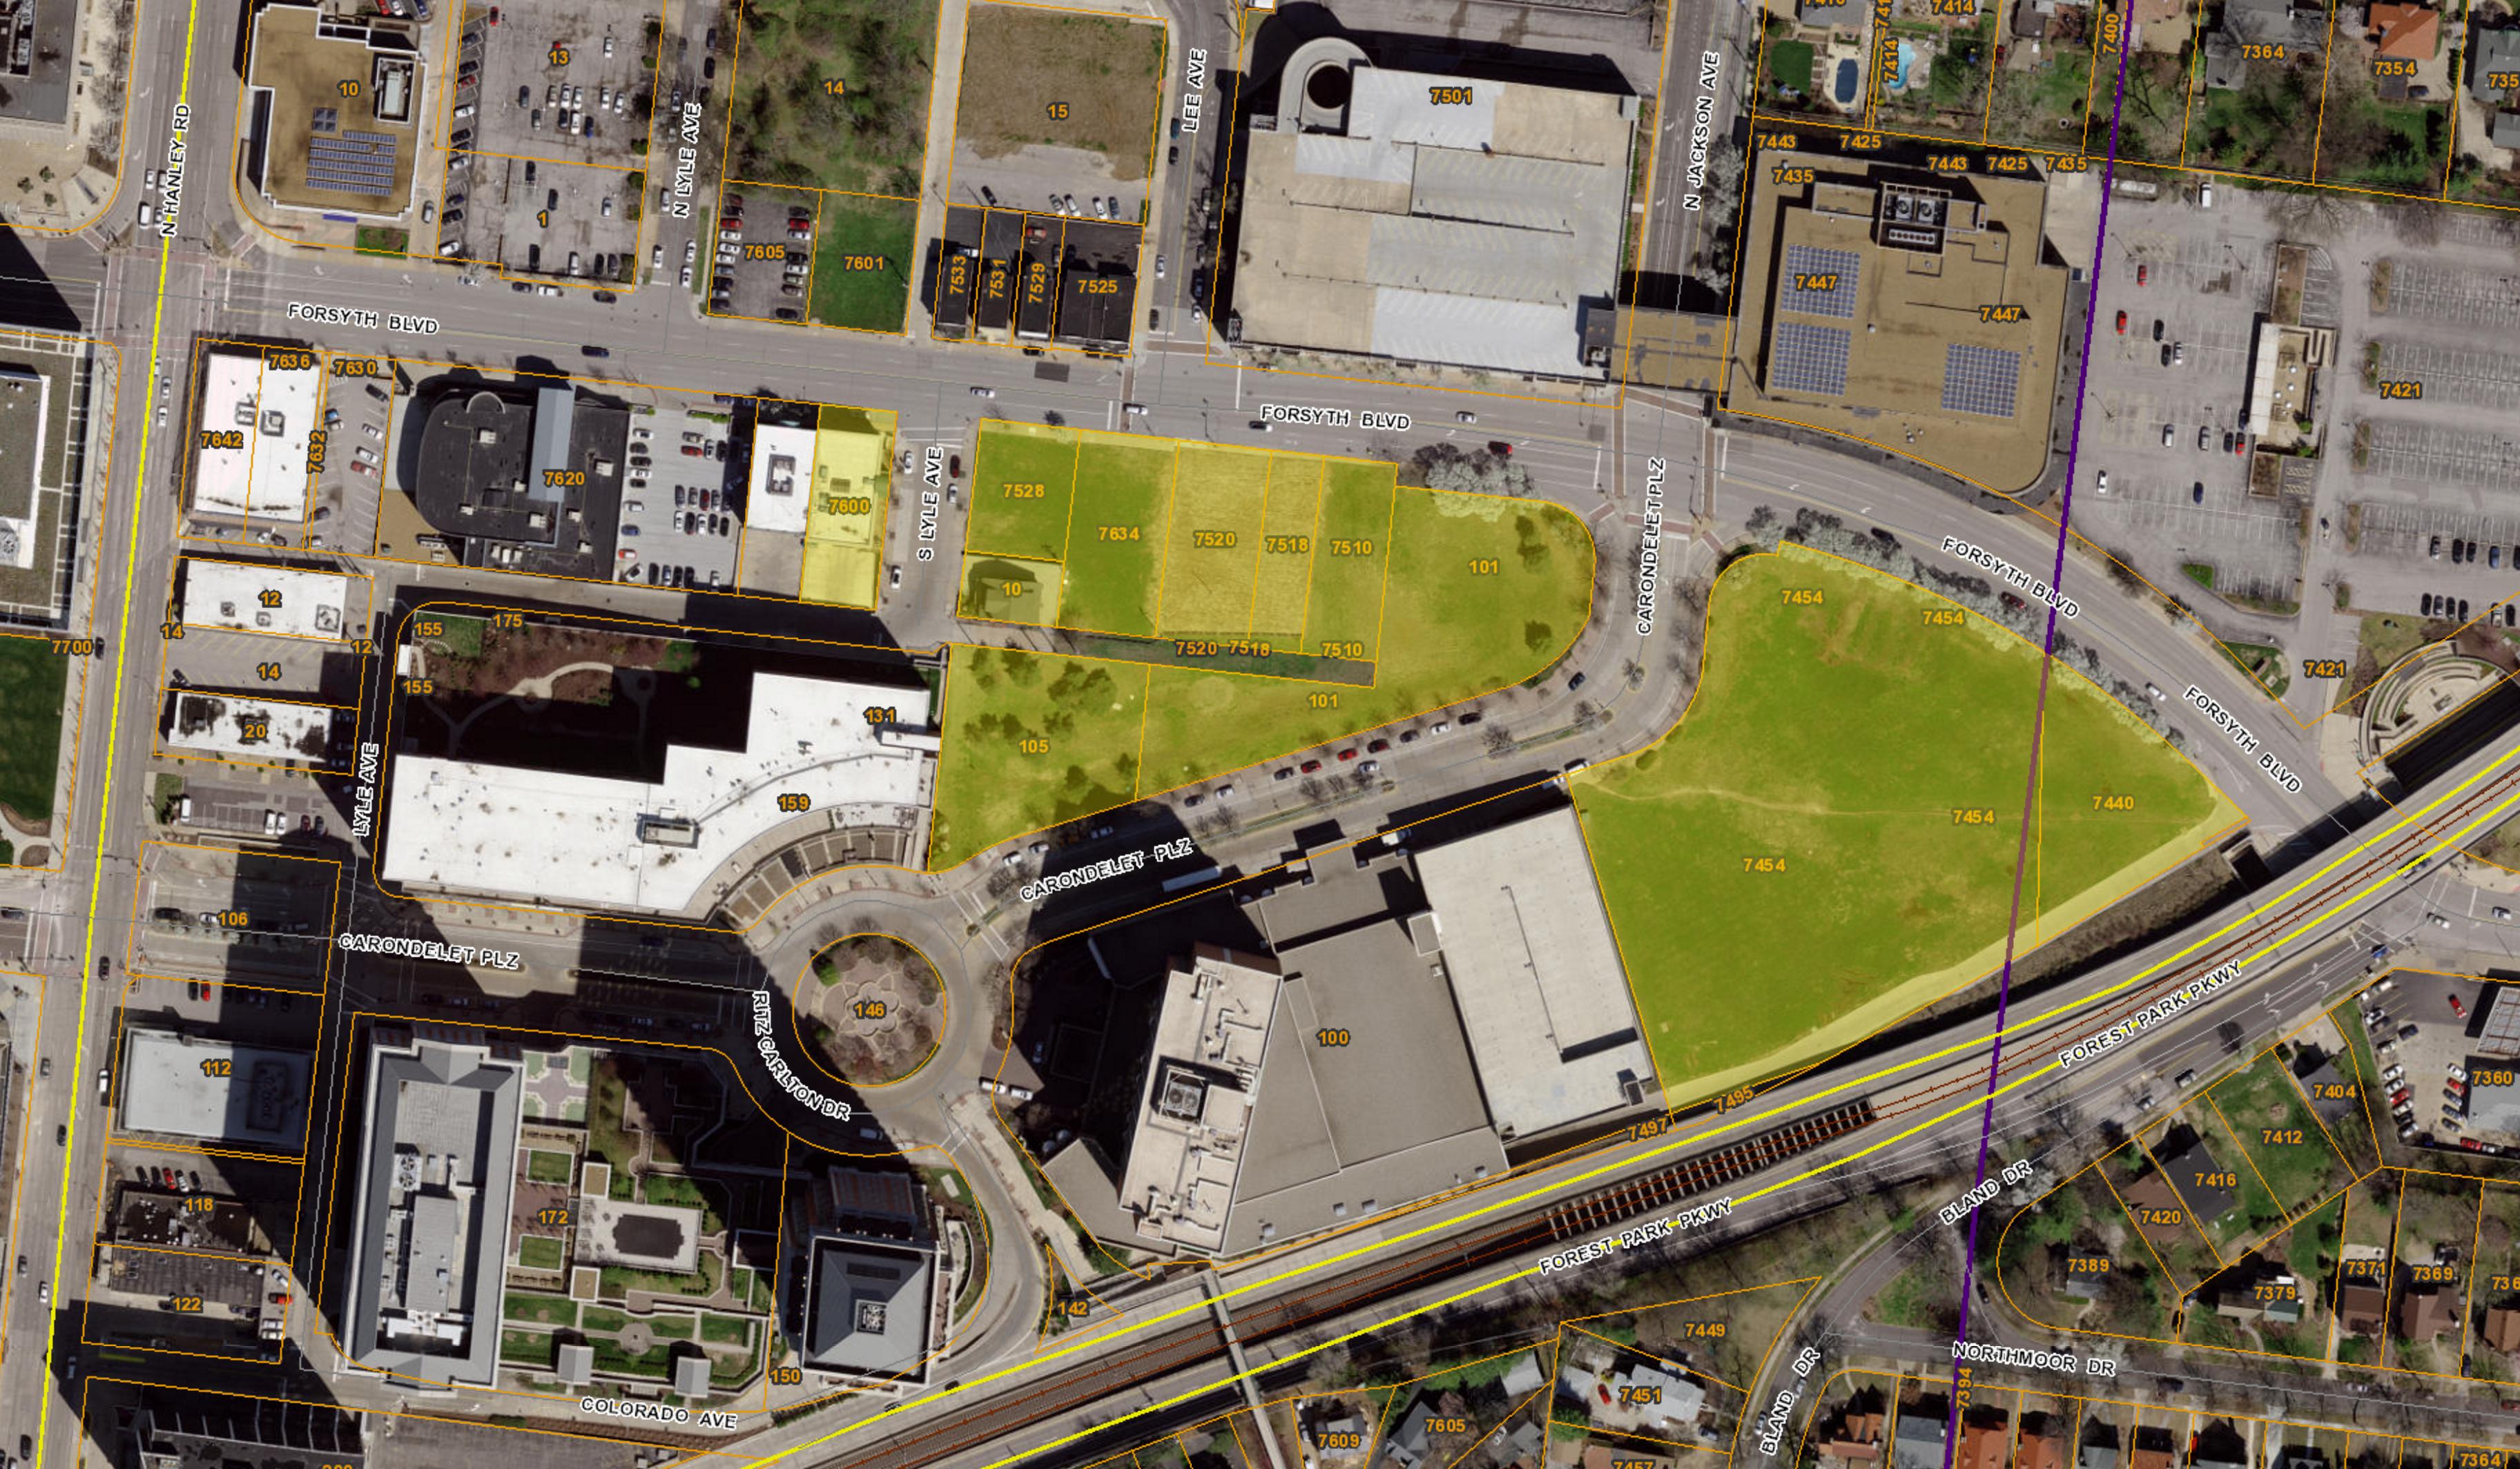 Centene Acquires More Land, Set to Go Big in Clayton